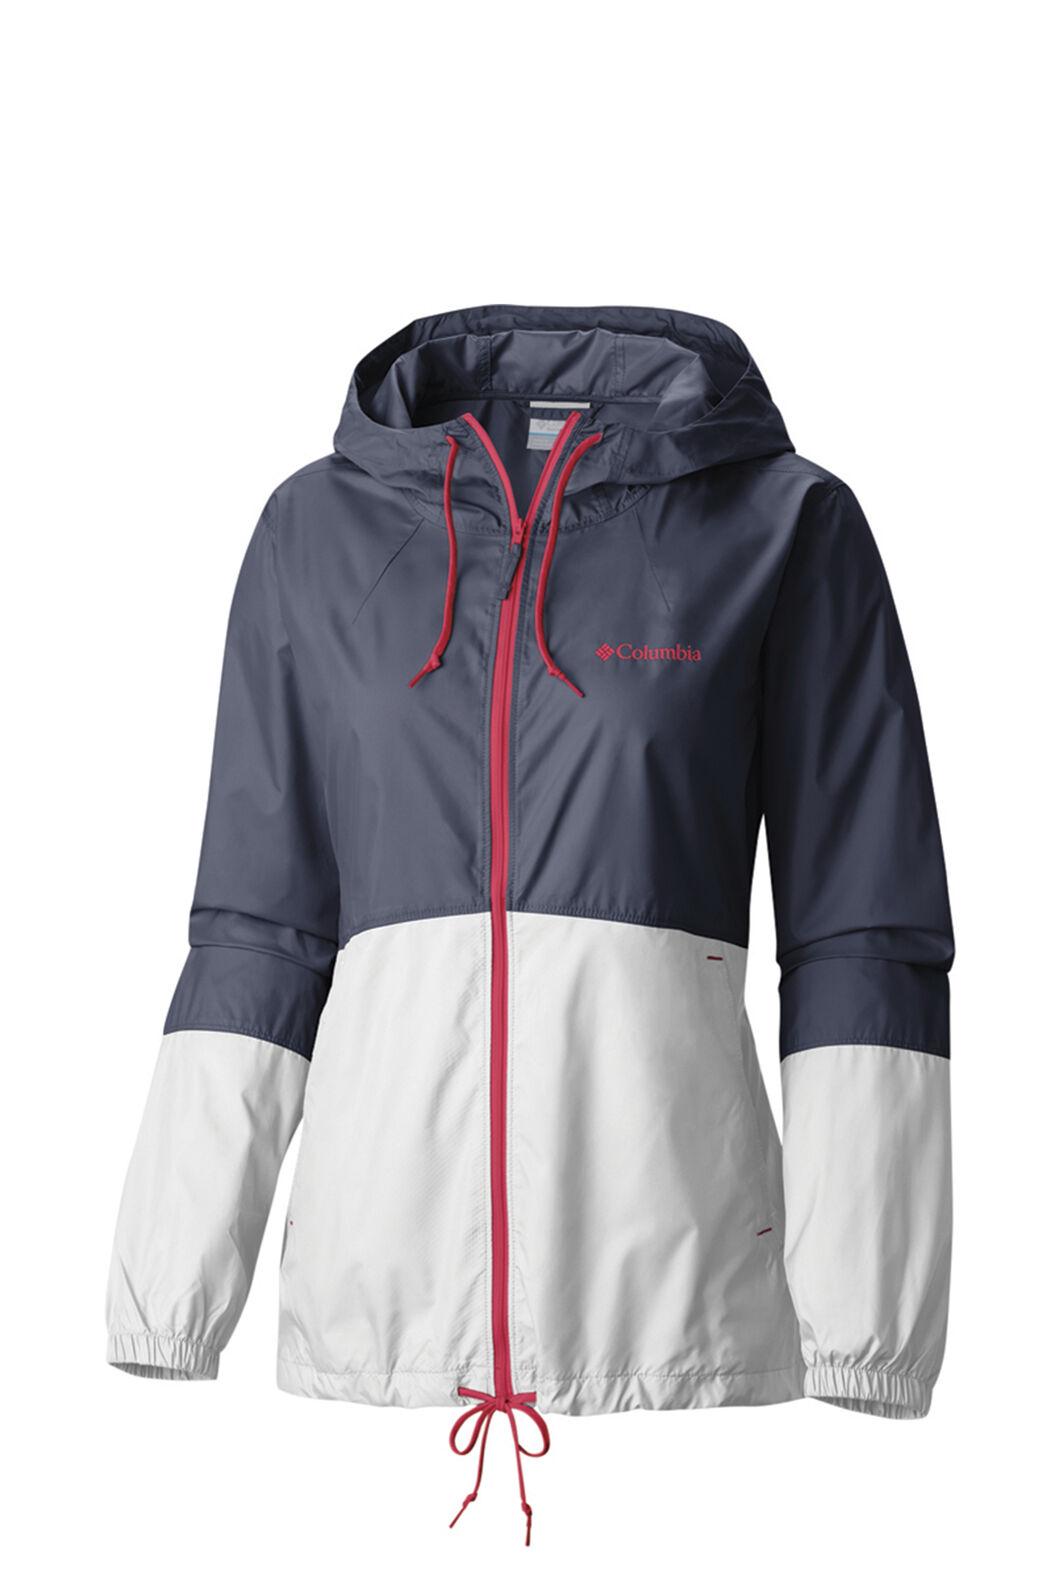 Columbia Women's Flash Forward Windbreaker Jacket NocturnalSand, NOCTURNAL, hi-res